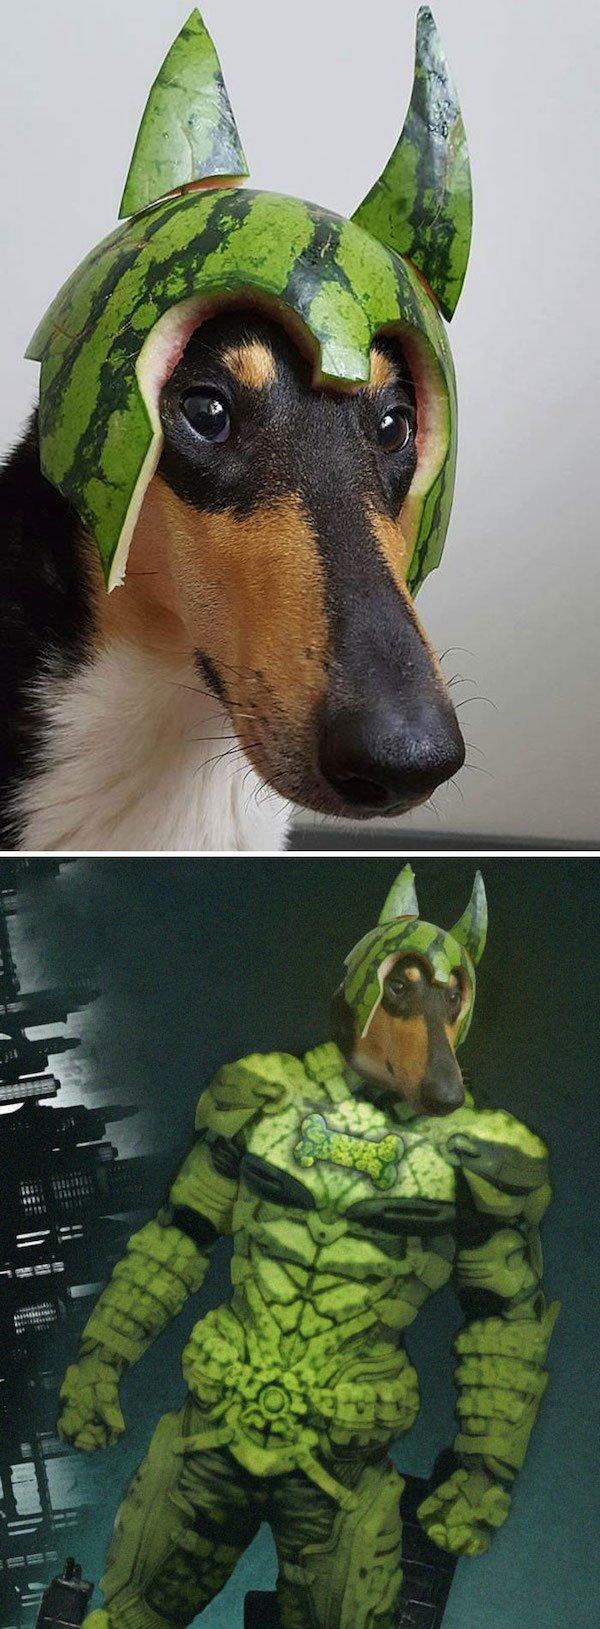 Funny Photoshop, part 2